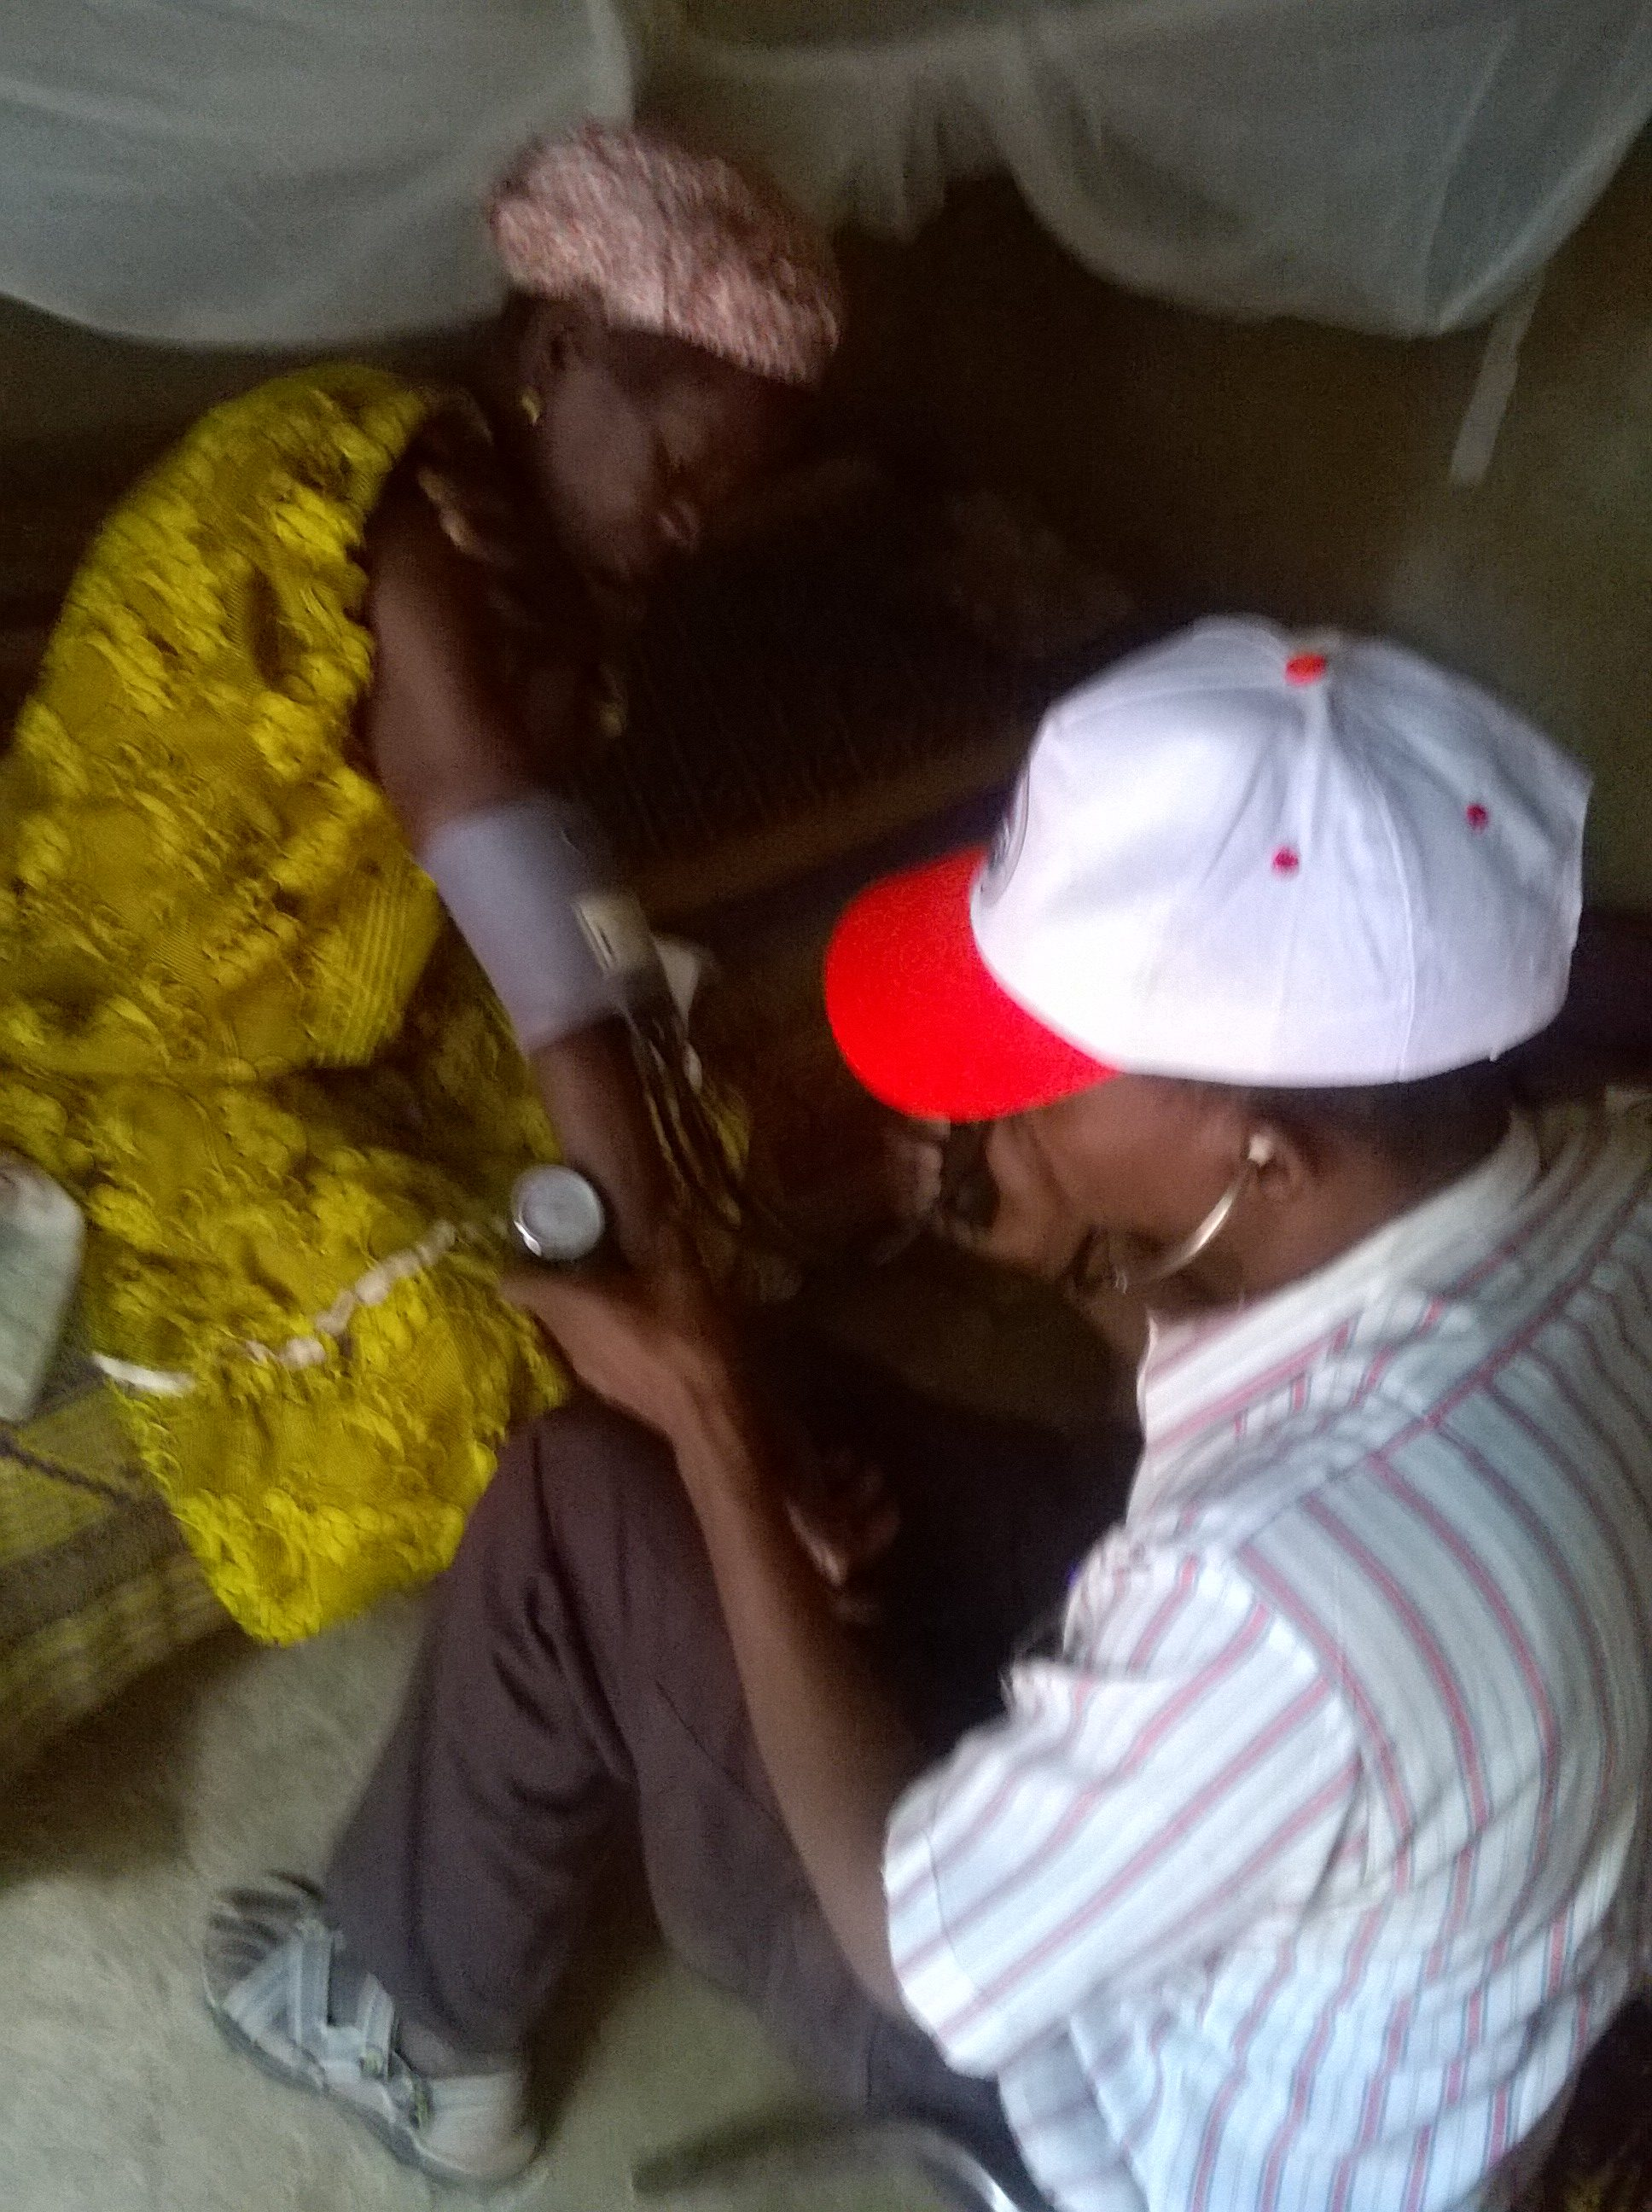 29 Juillet 2017, Ouolodo, Mali